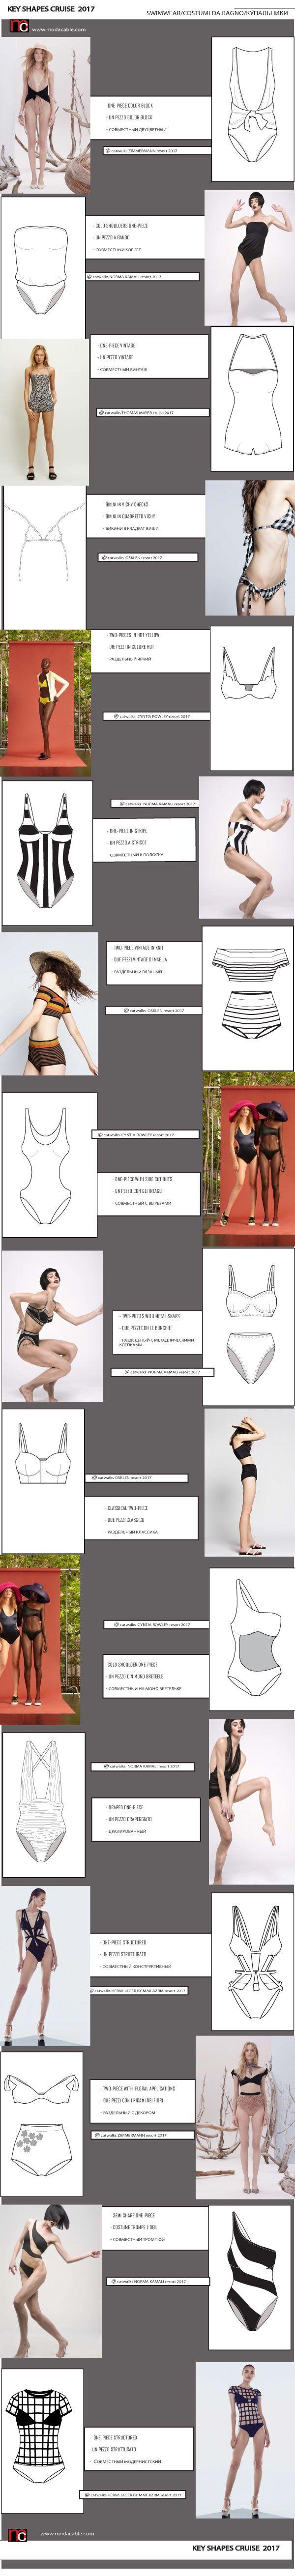 resort 2017 swimwear key shapes are already on Modacable.com